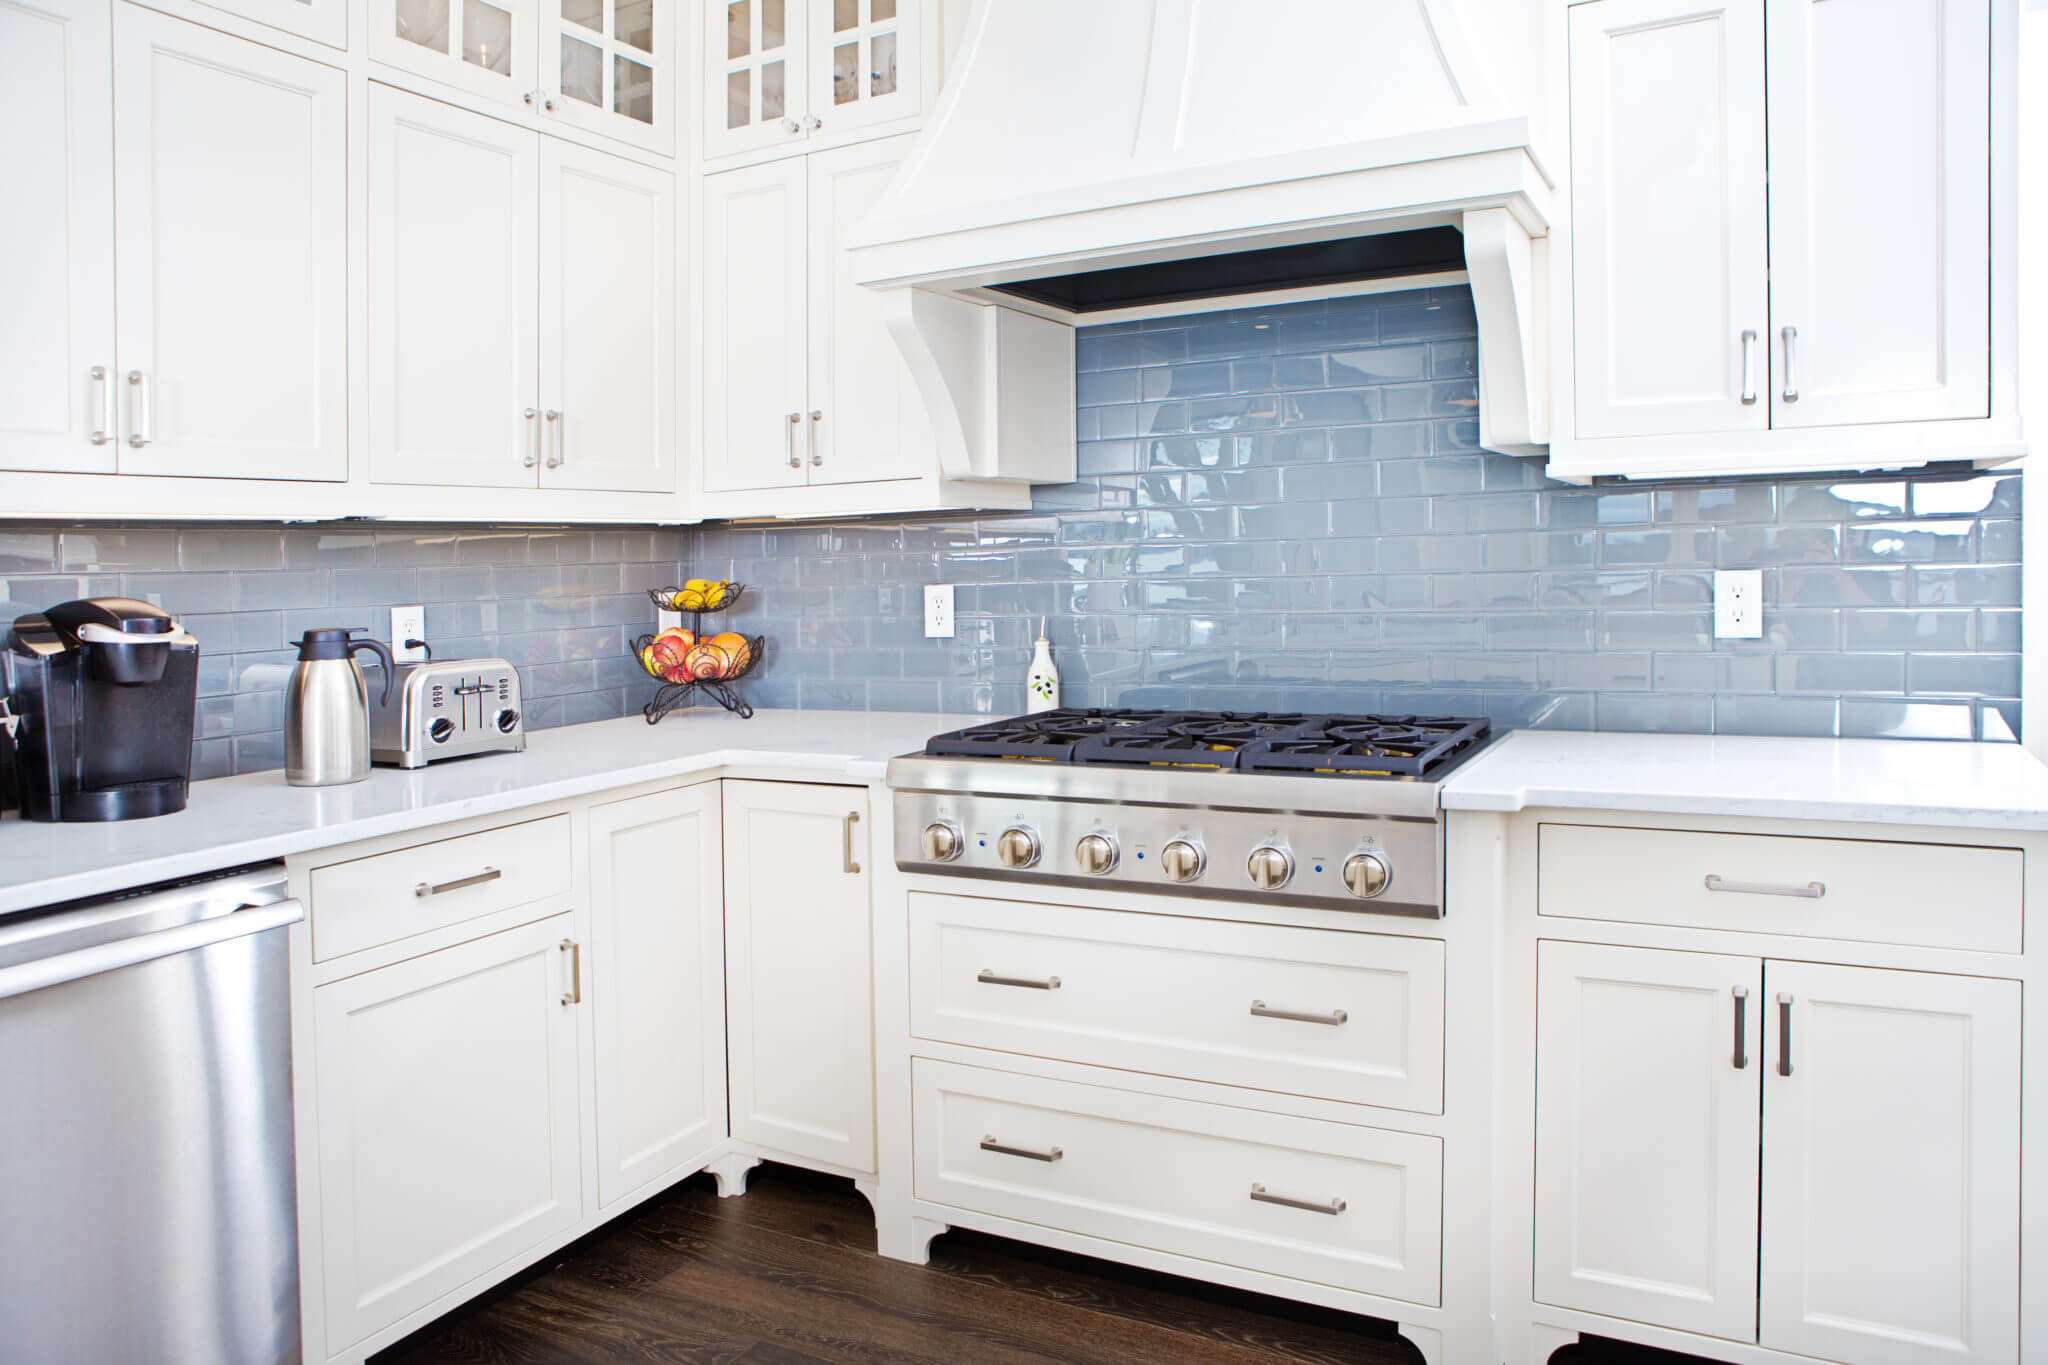 Kitchen with light blue subway tile backsplash